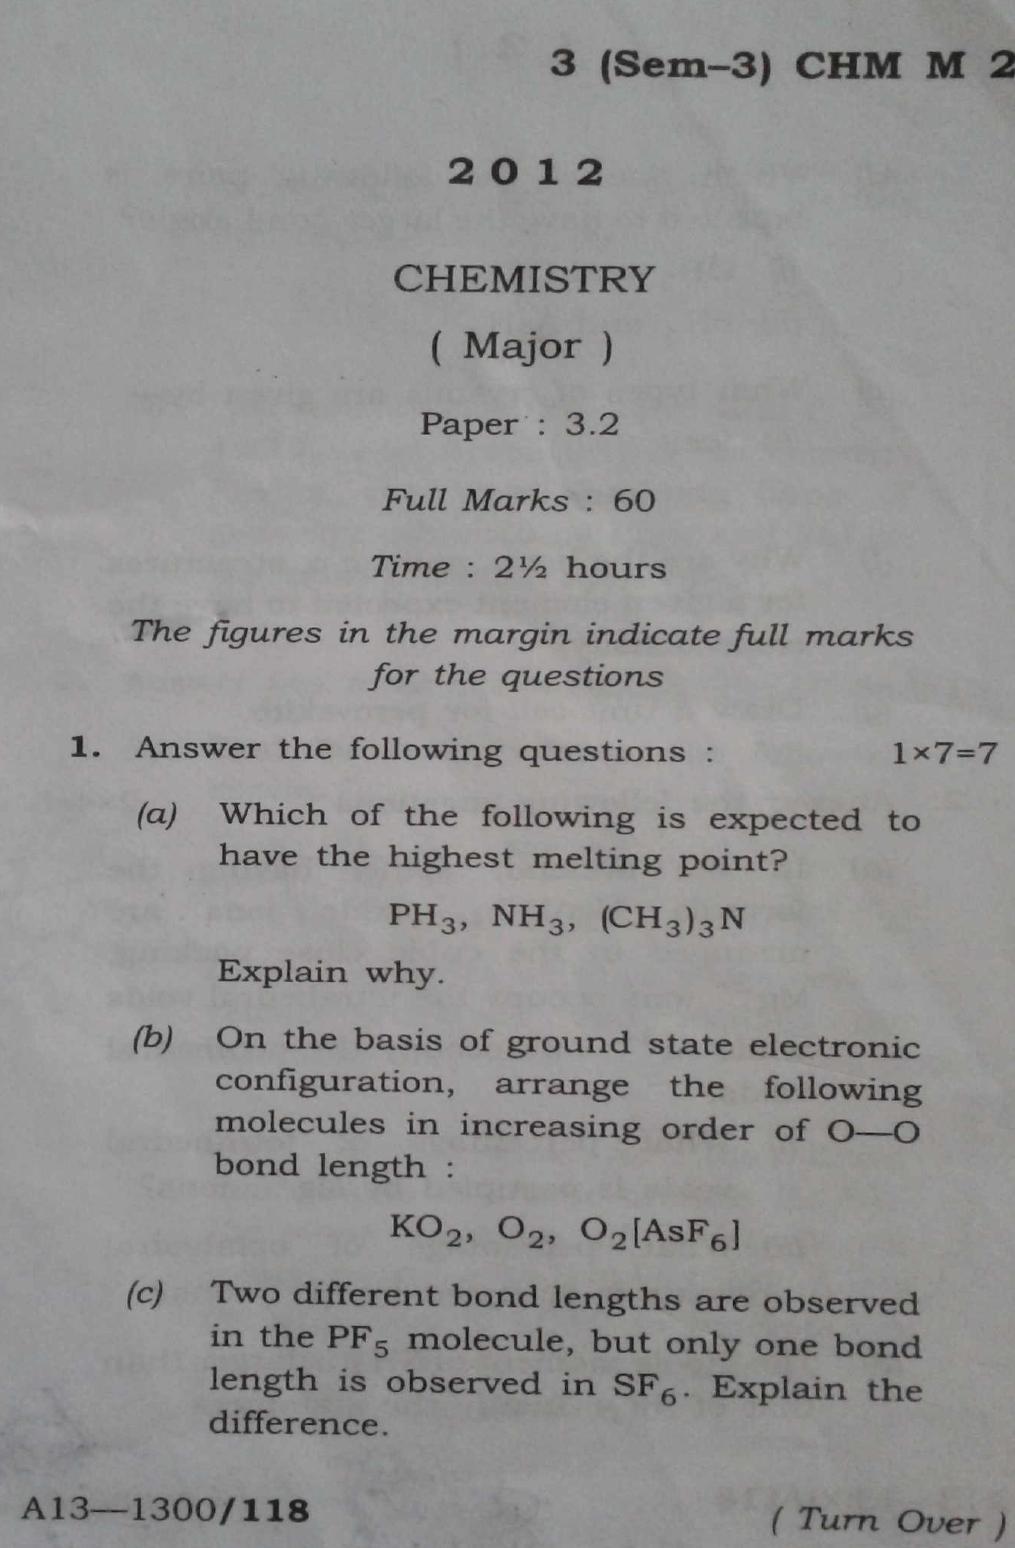 Gauhati University BSc Chemistry Major 2nd Sem 2012 Question